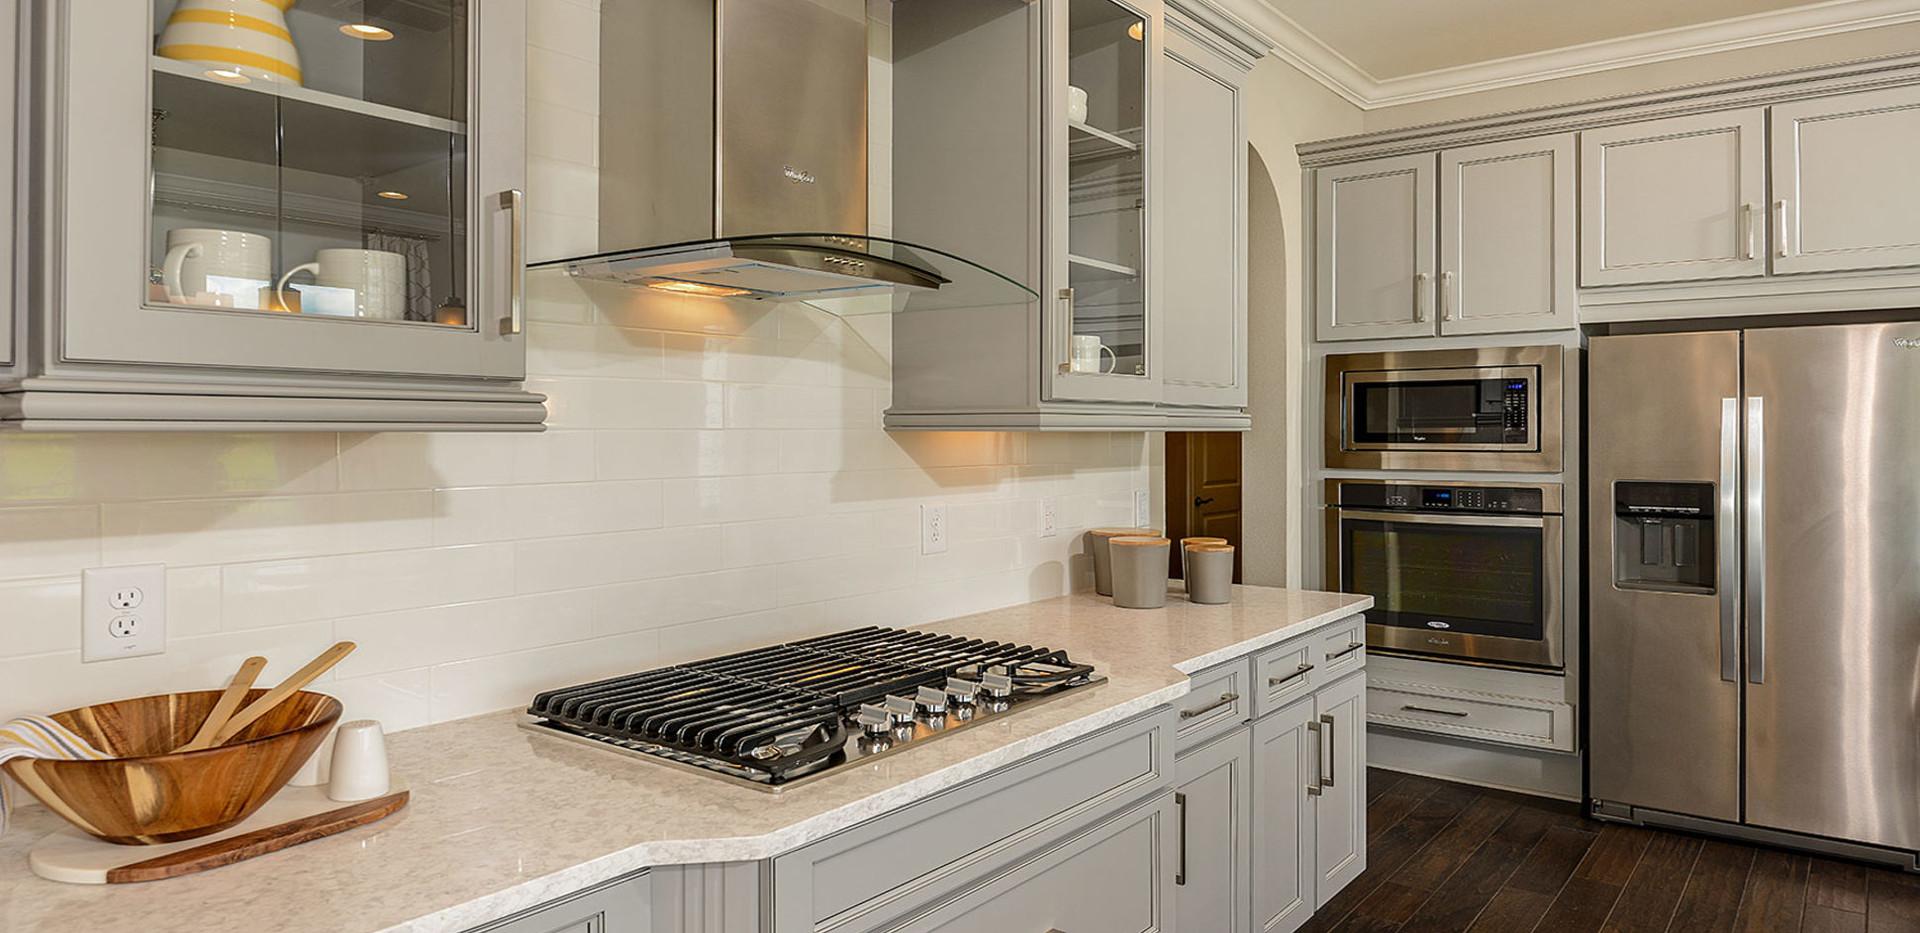 Waterside model home kitchen